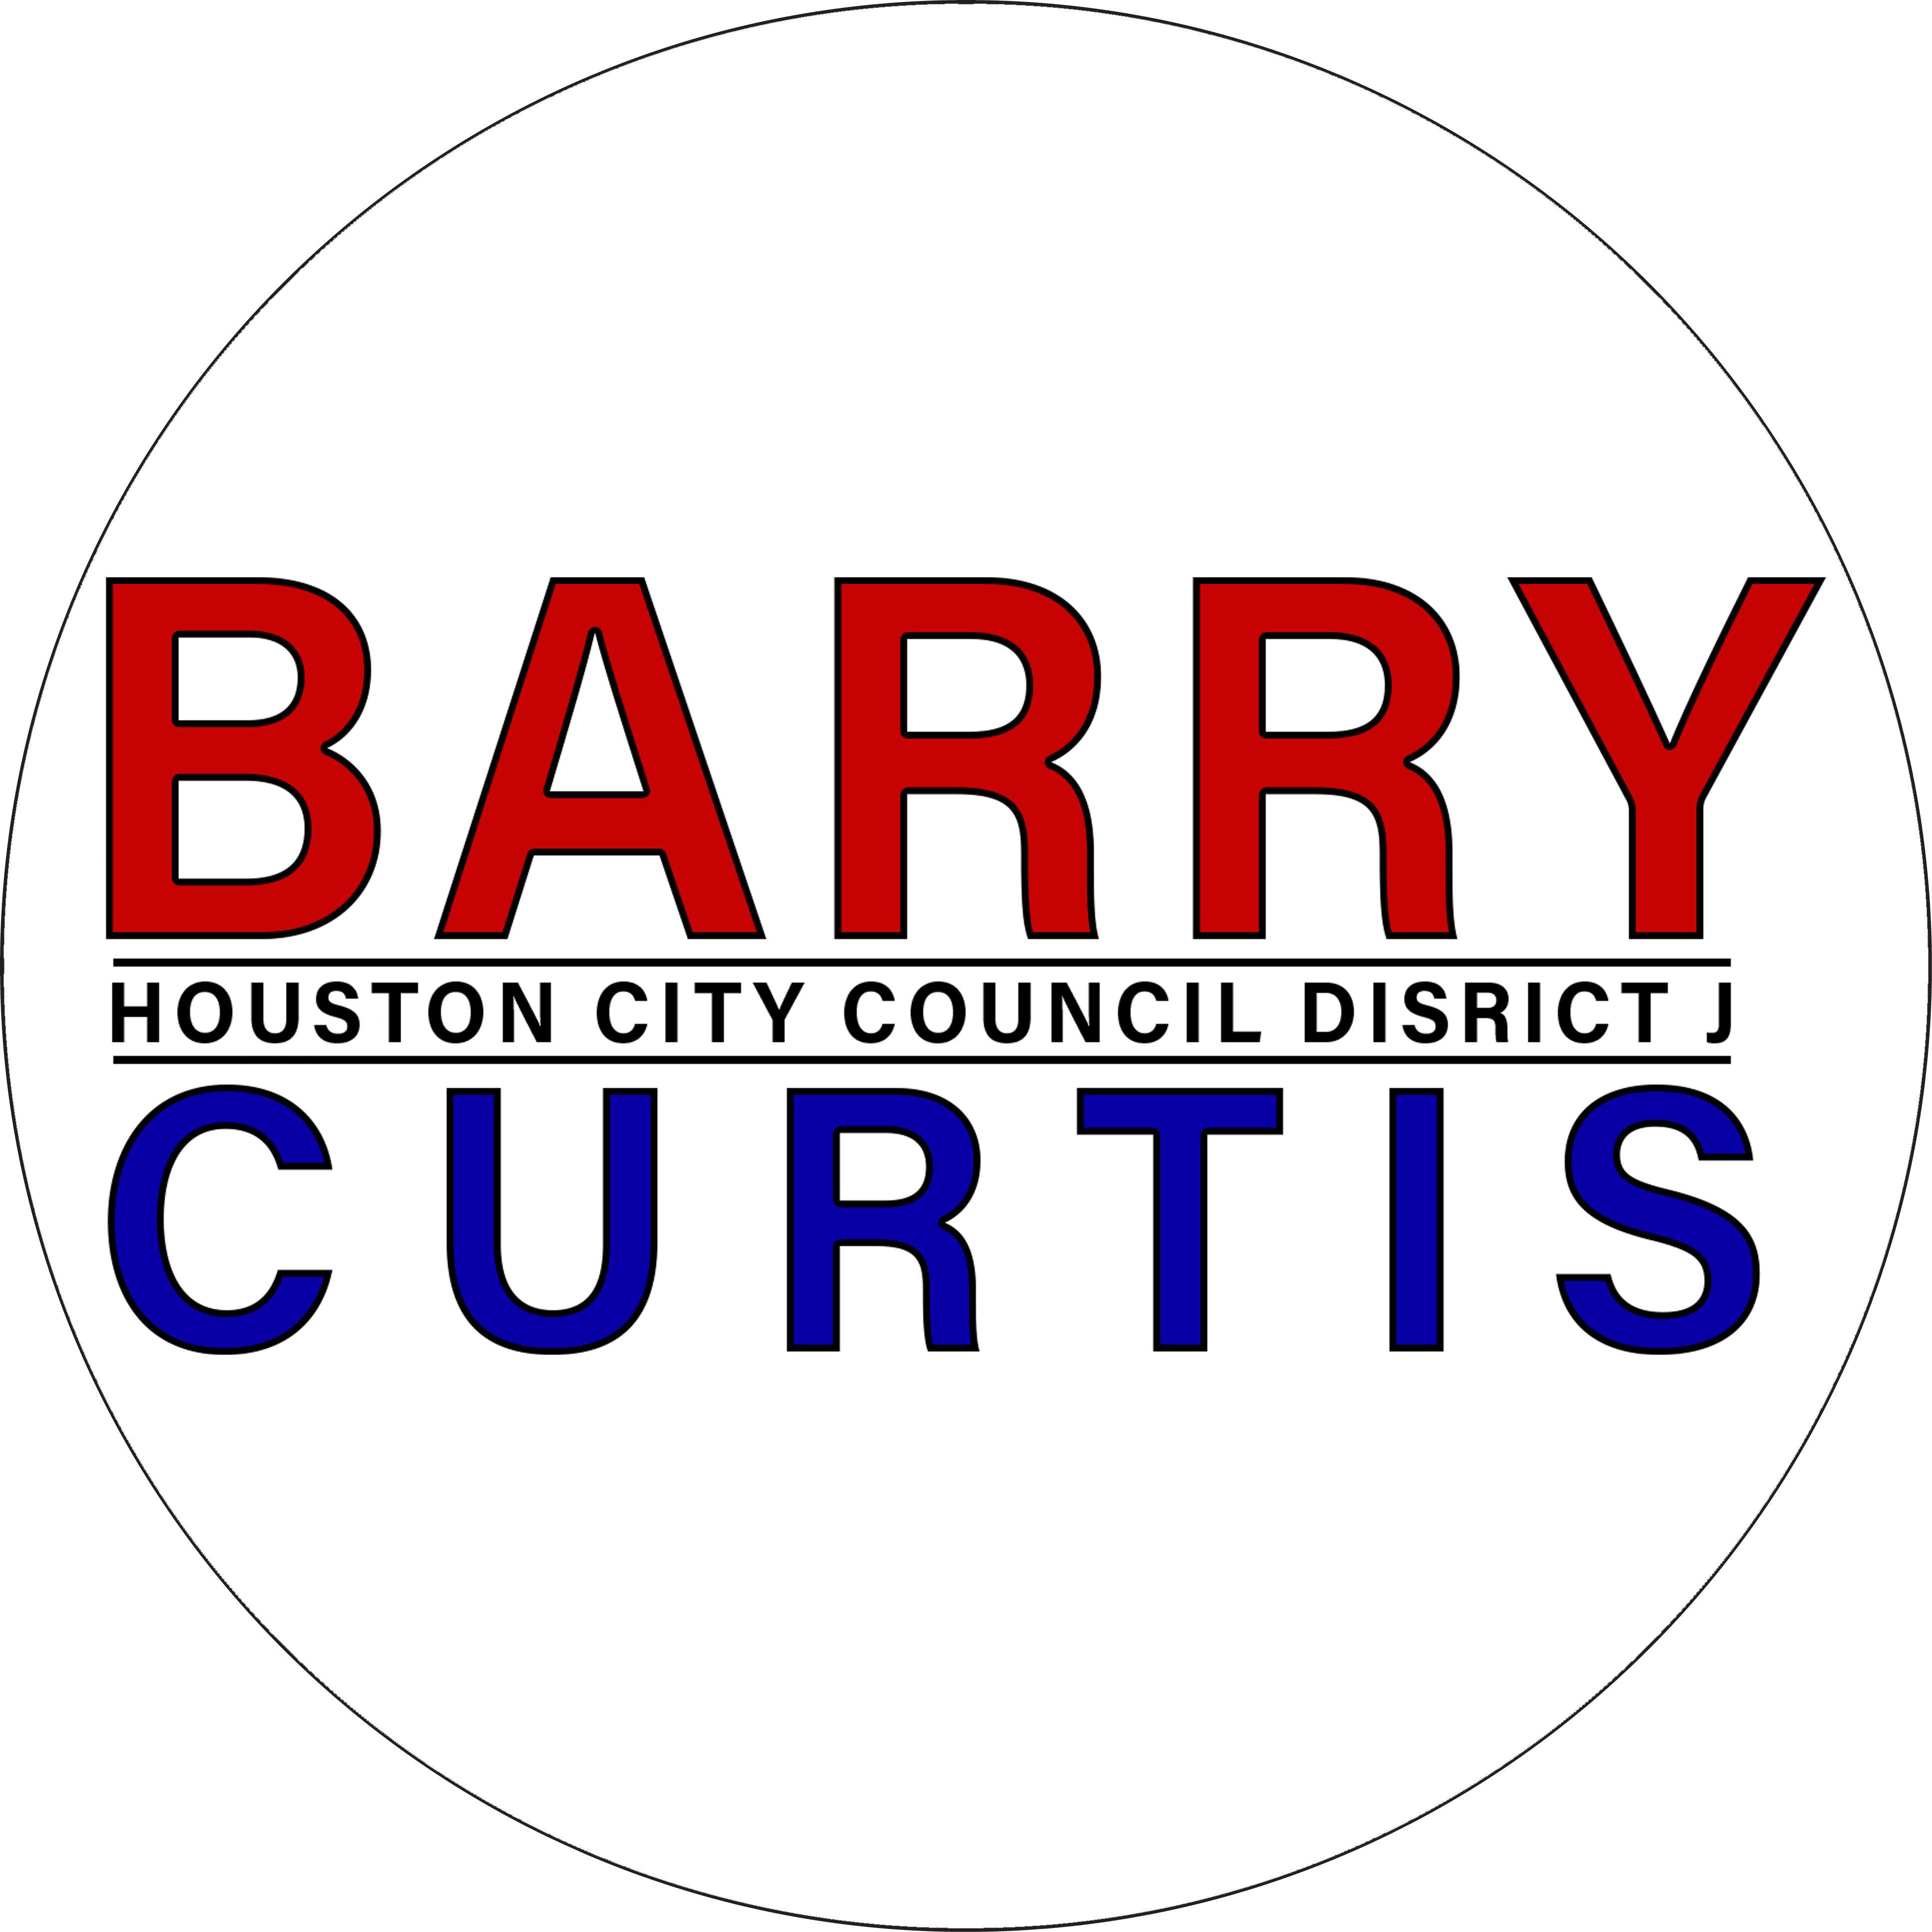 barrycurtis